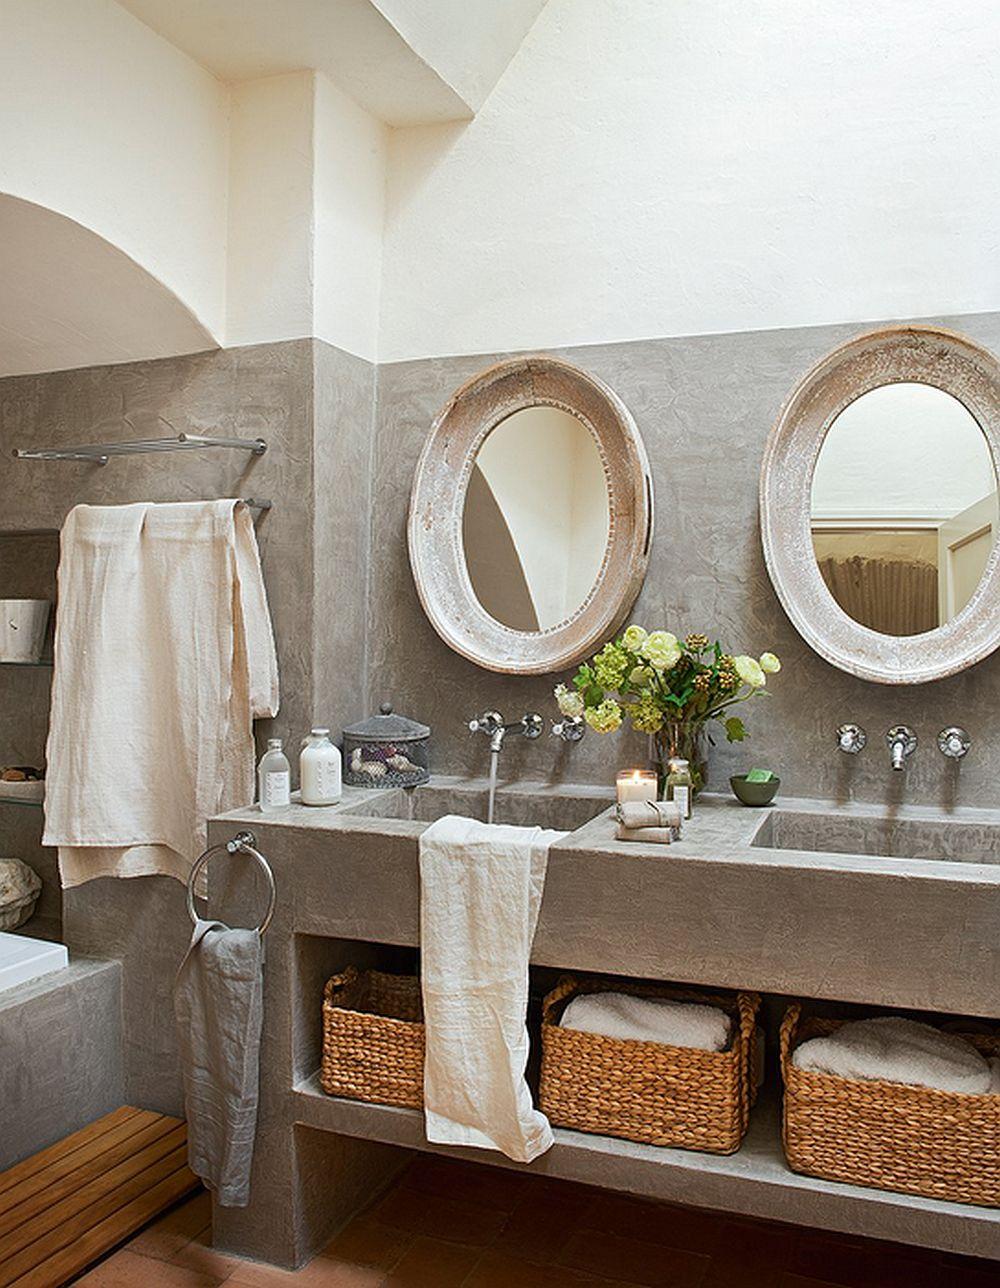 adelaparvu.com despre casa rustica Spania, hambar transformat in casa, arhitecti Lluís Auquer si Ferran Prats (22)